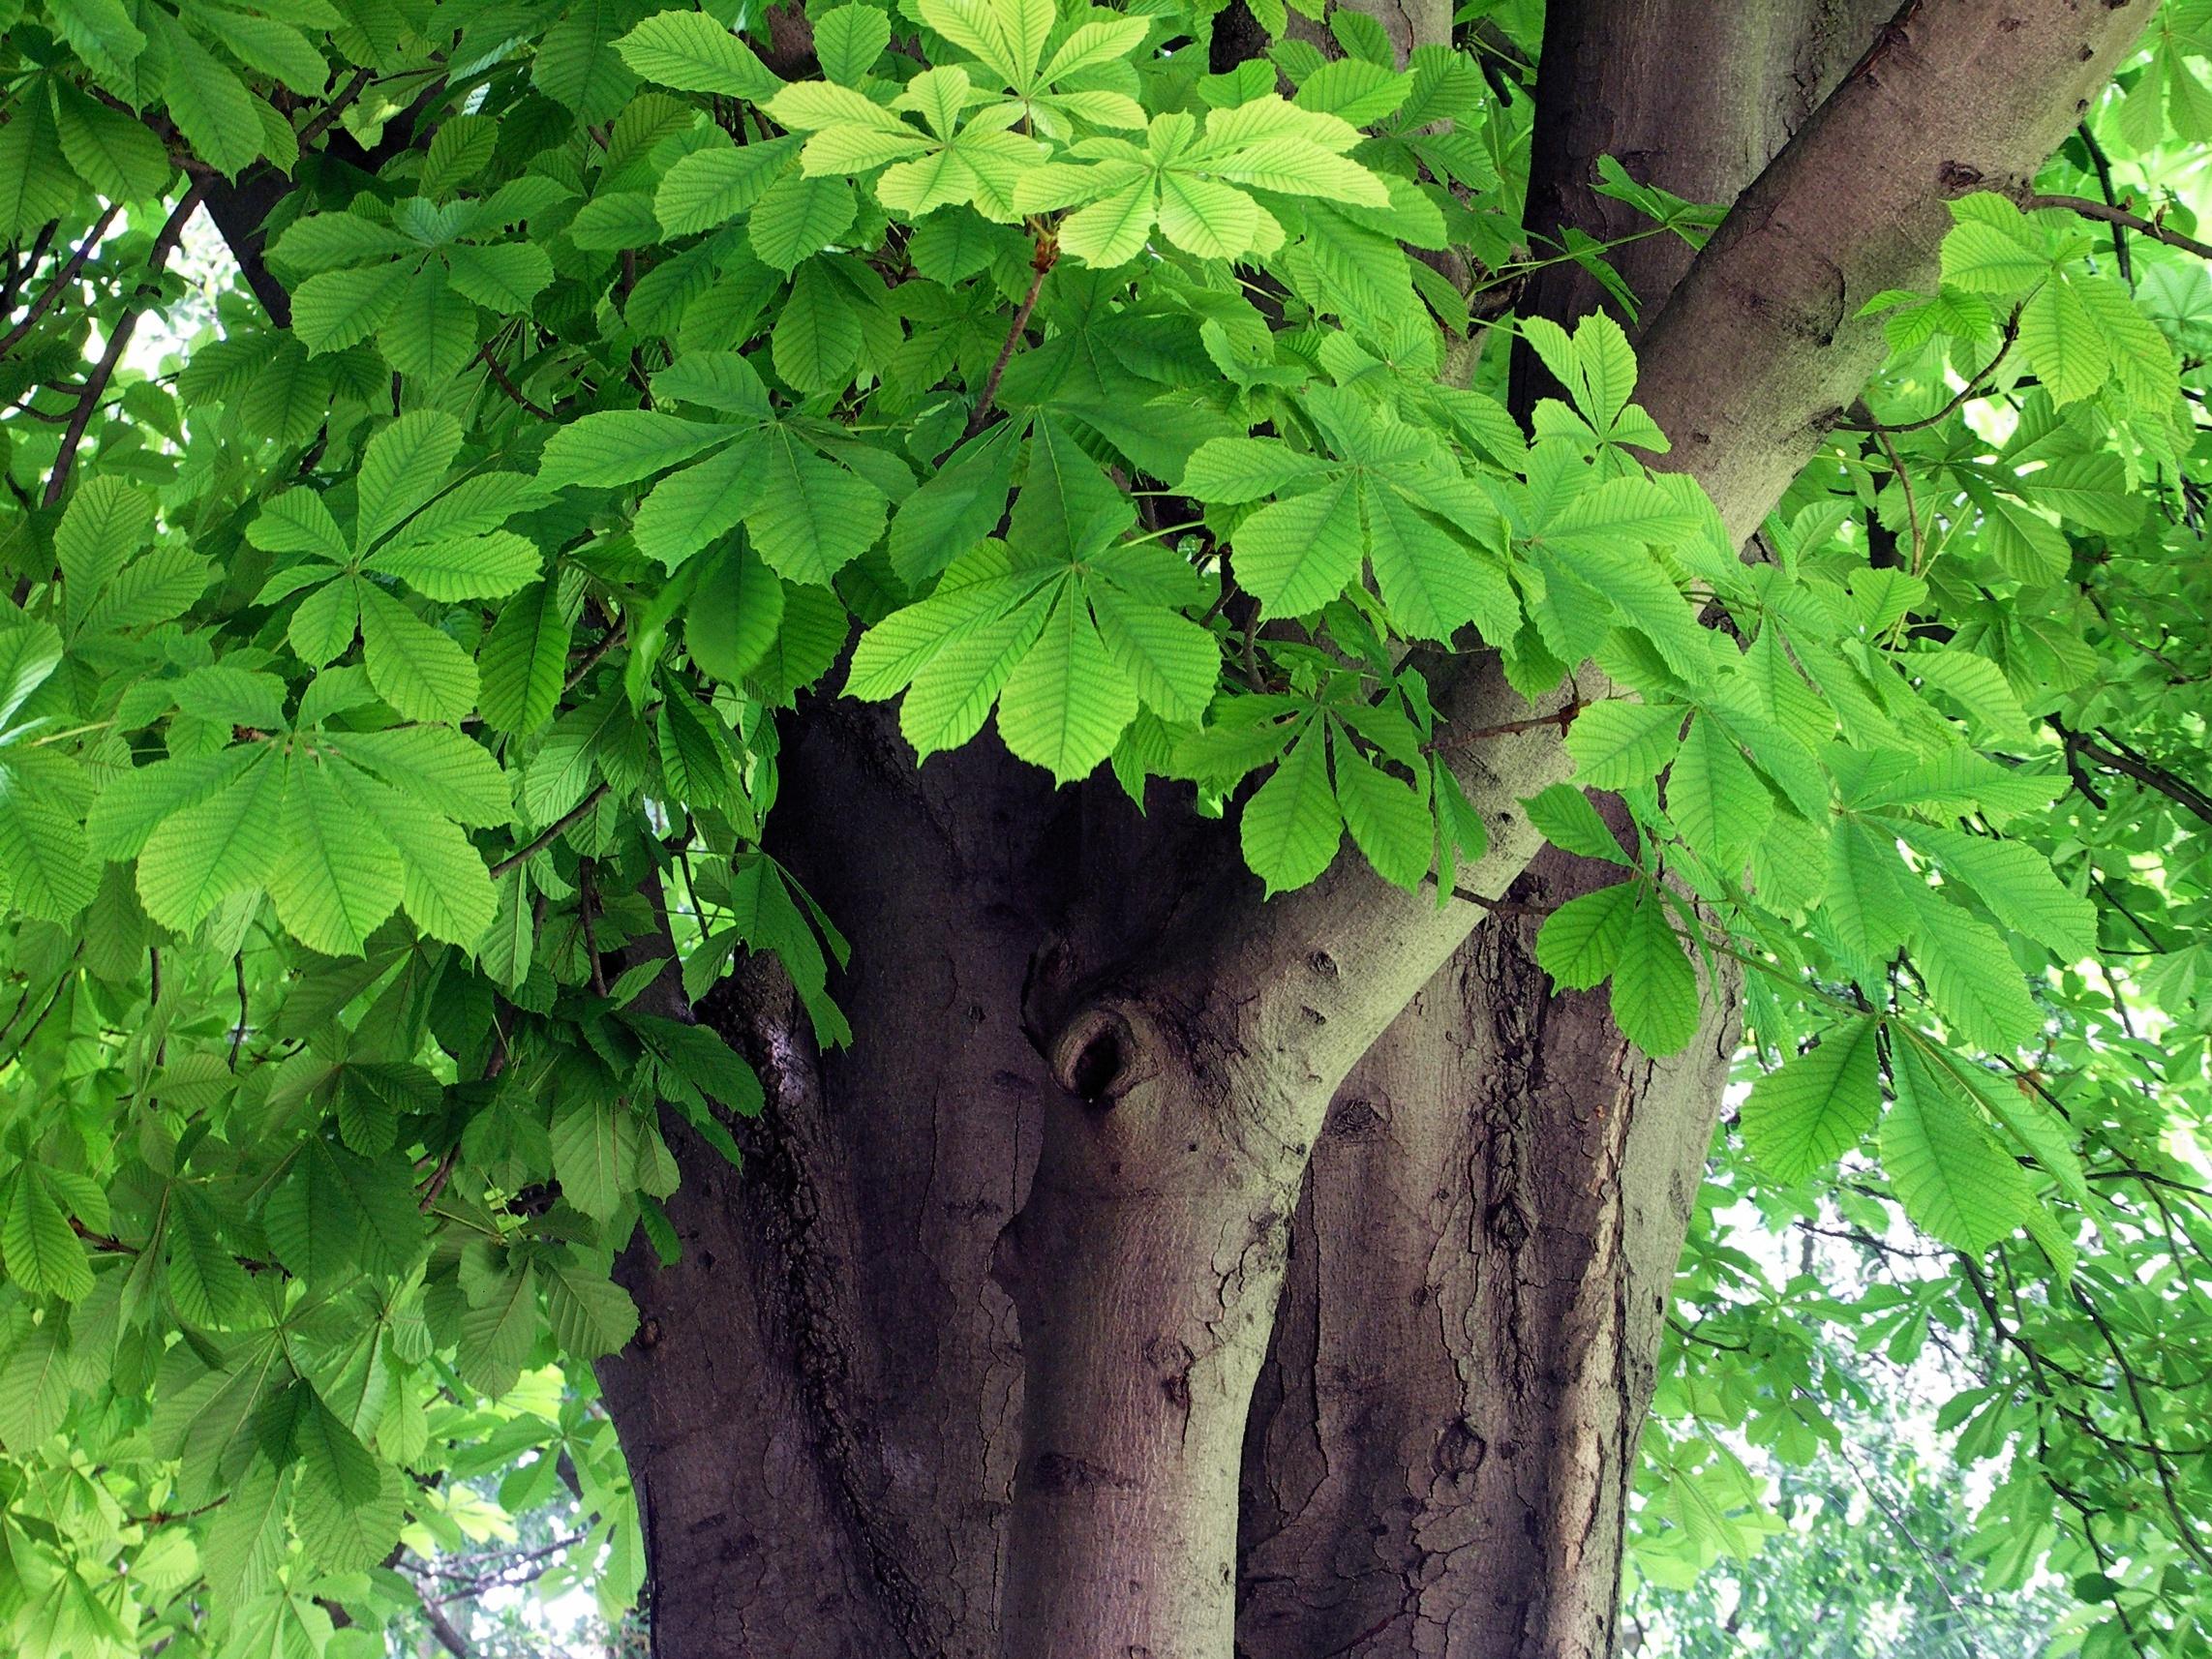 Tom clark james schuyler horse chestnut trees and roses for The chestnut